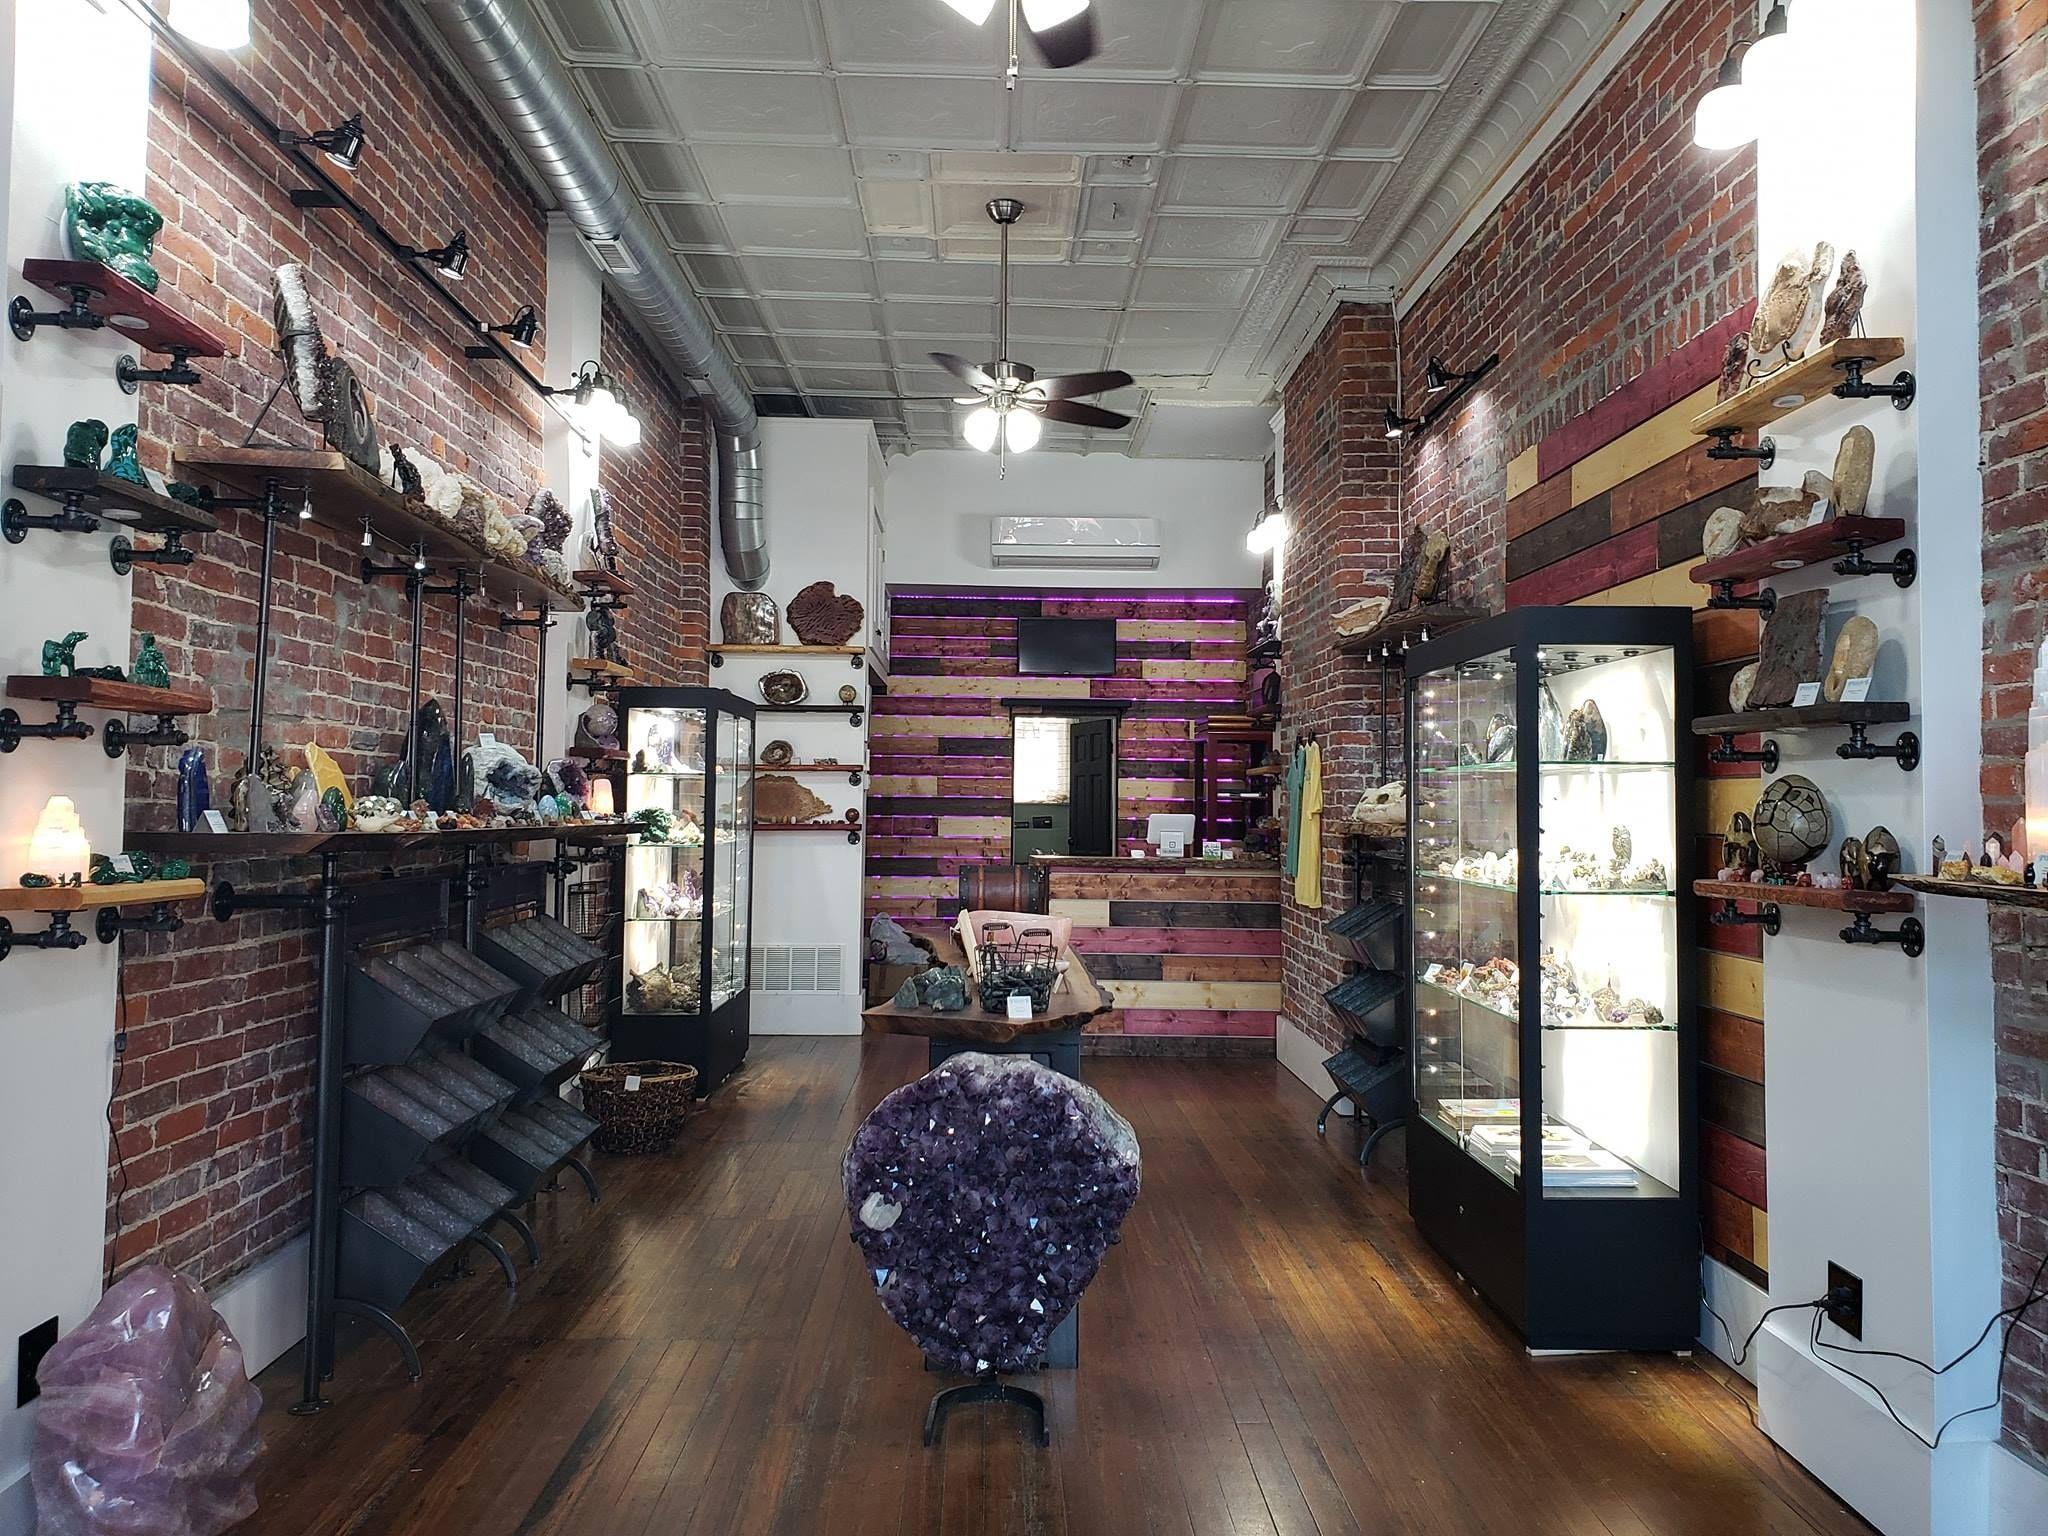 15 New Shops Salons Restaurants Now Open In Lawrenceville